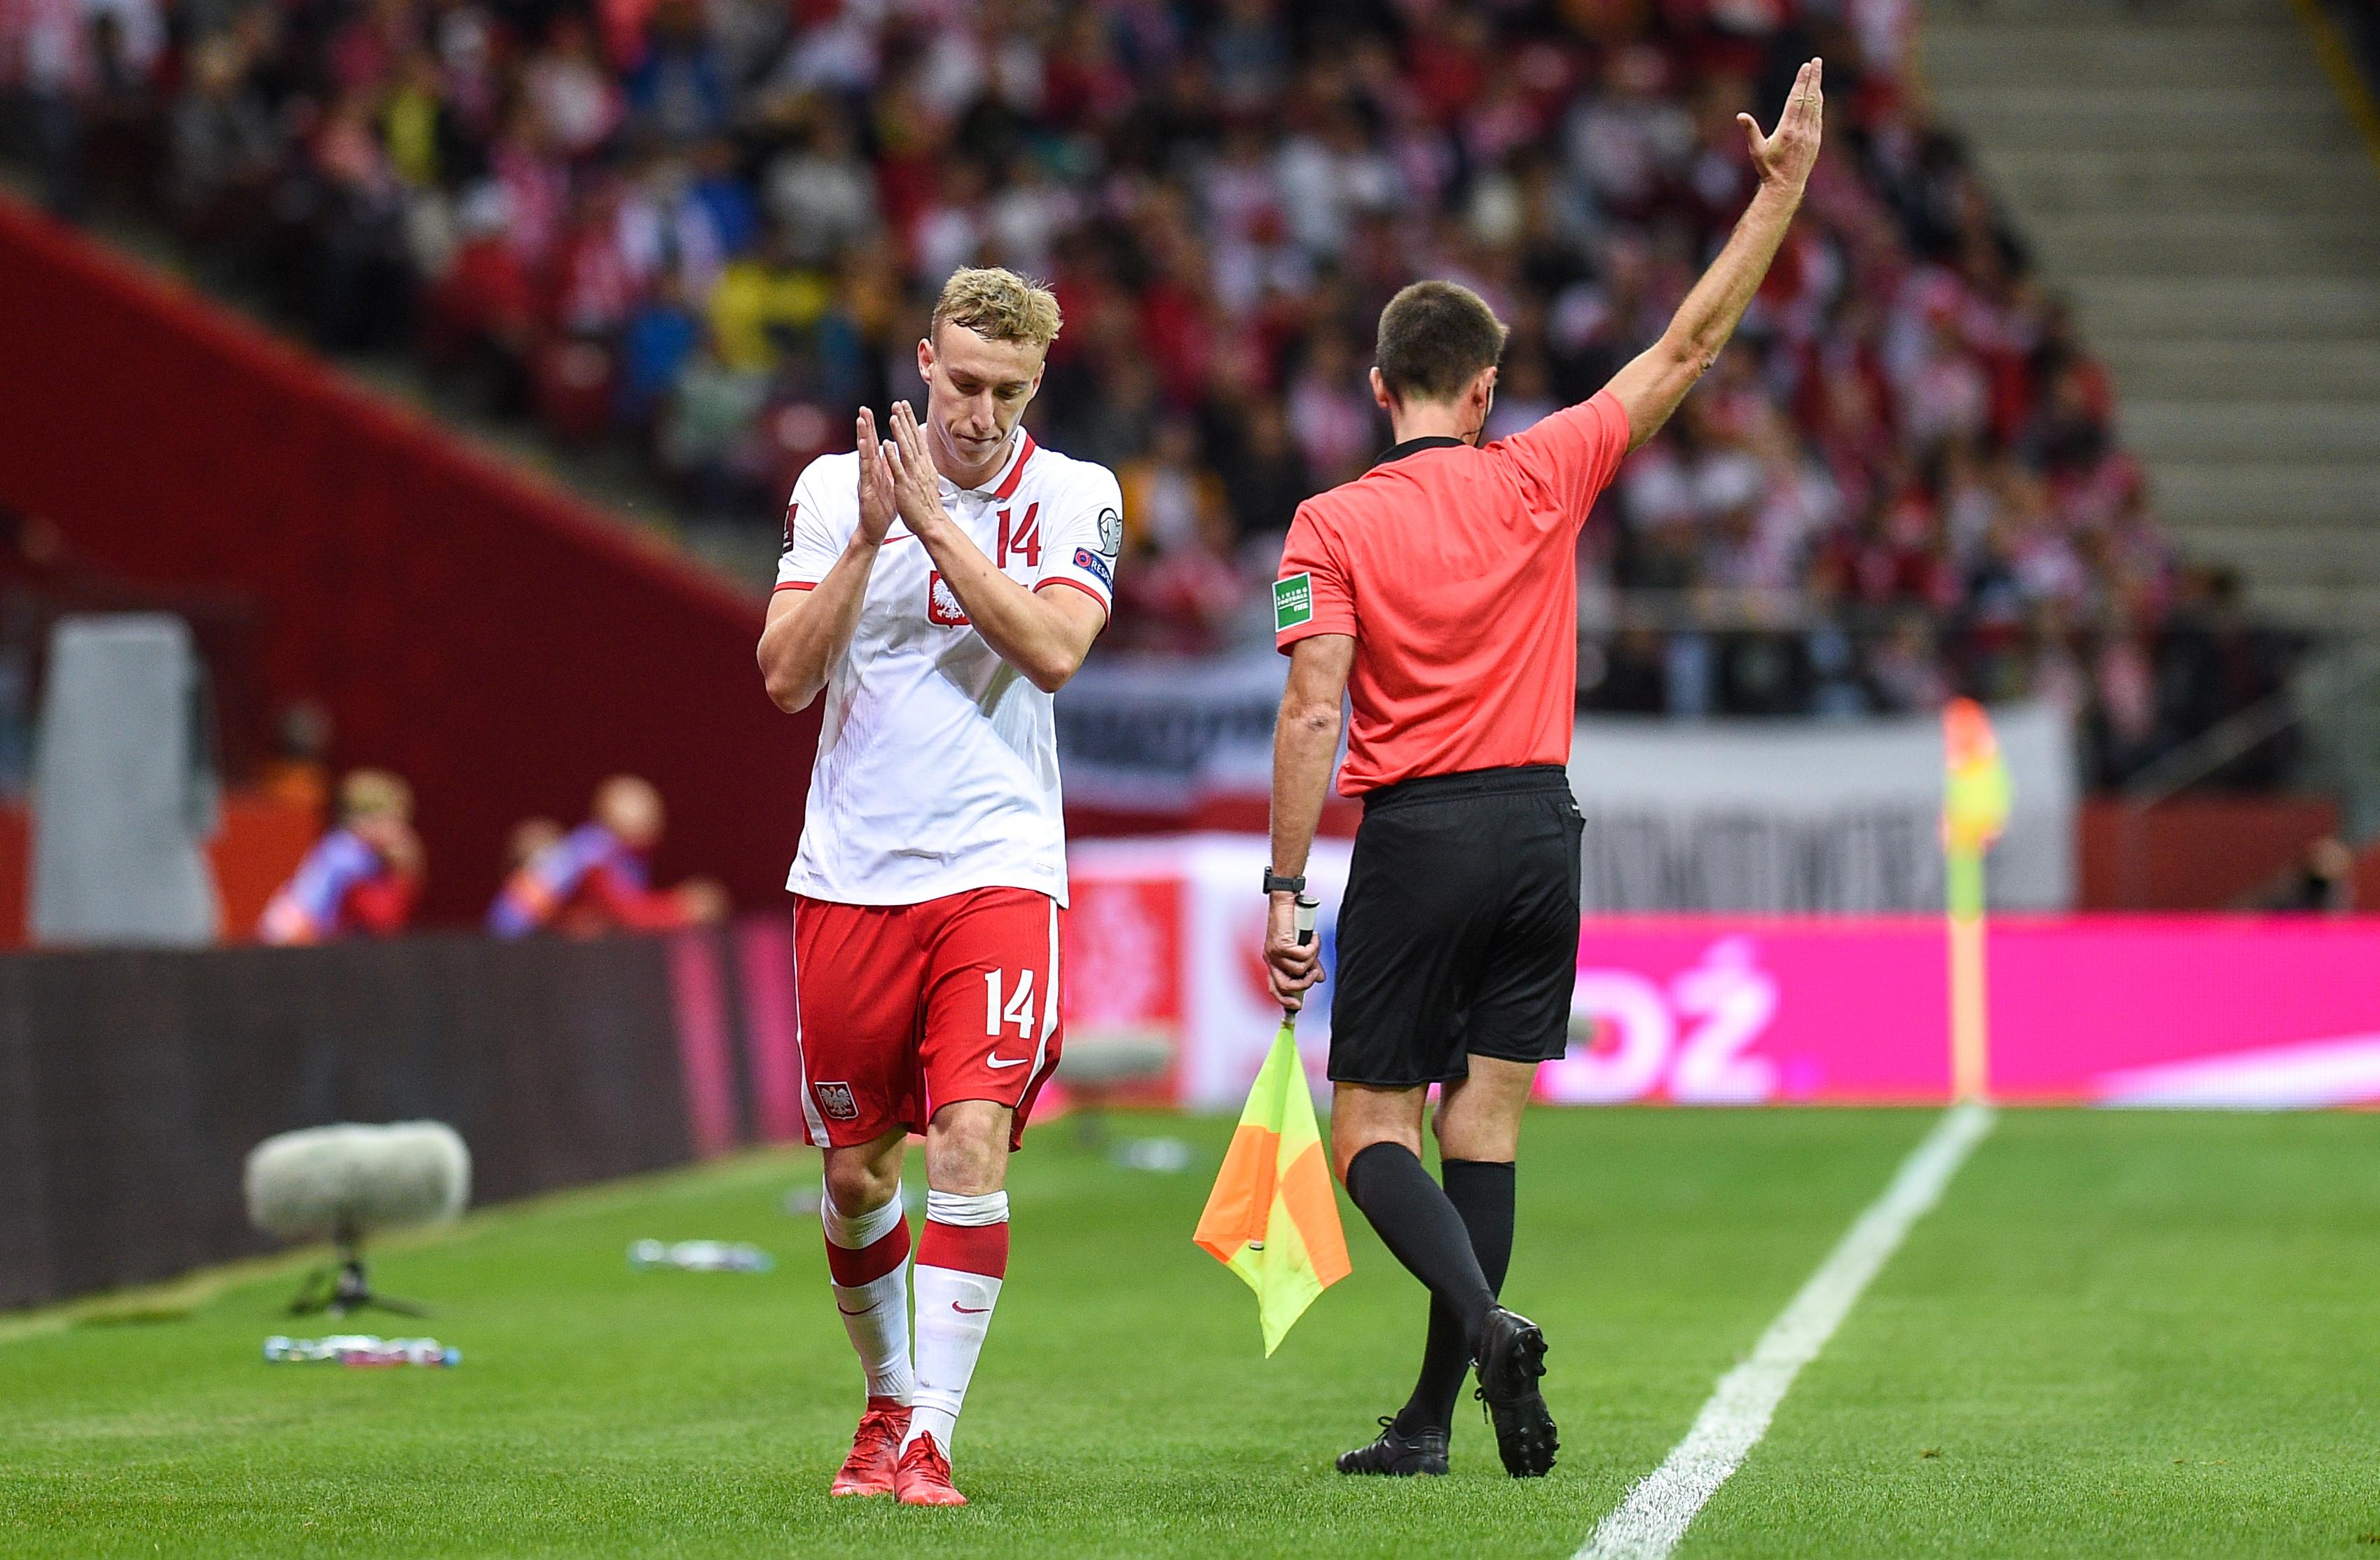 Poland v Albania - 2022 FIFA World Cup Qualifier